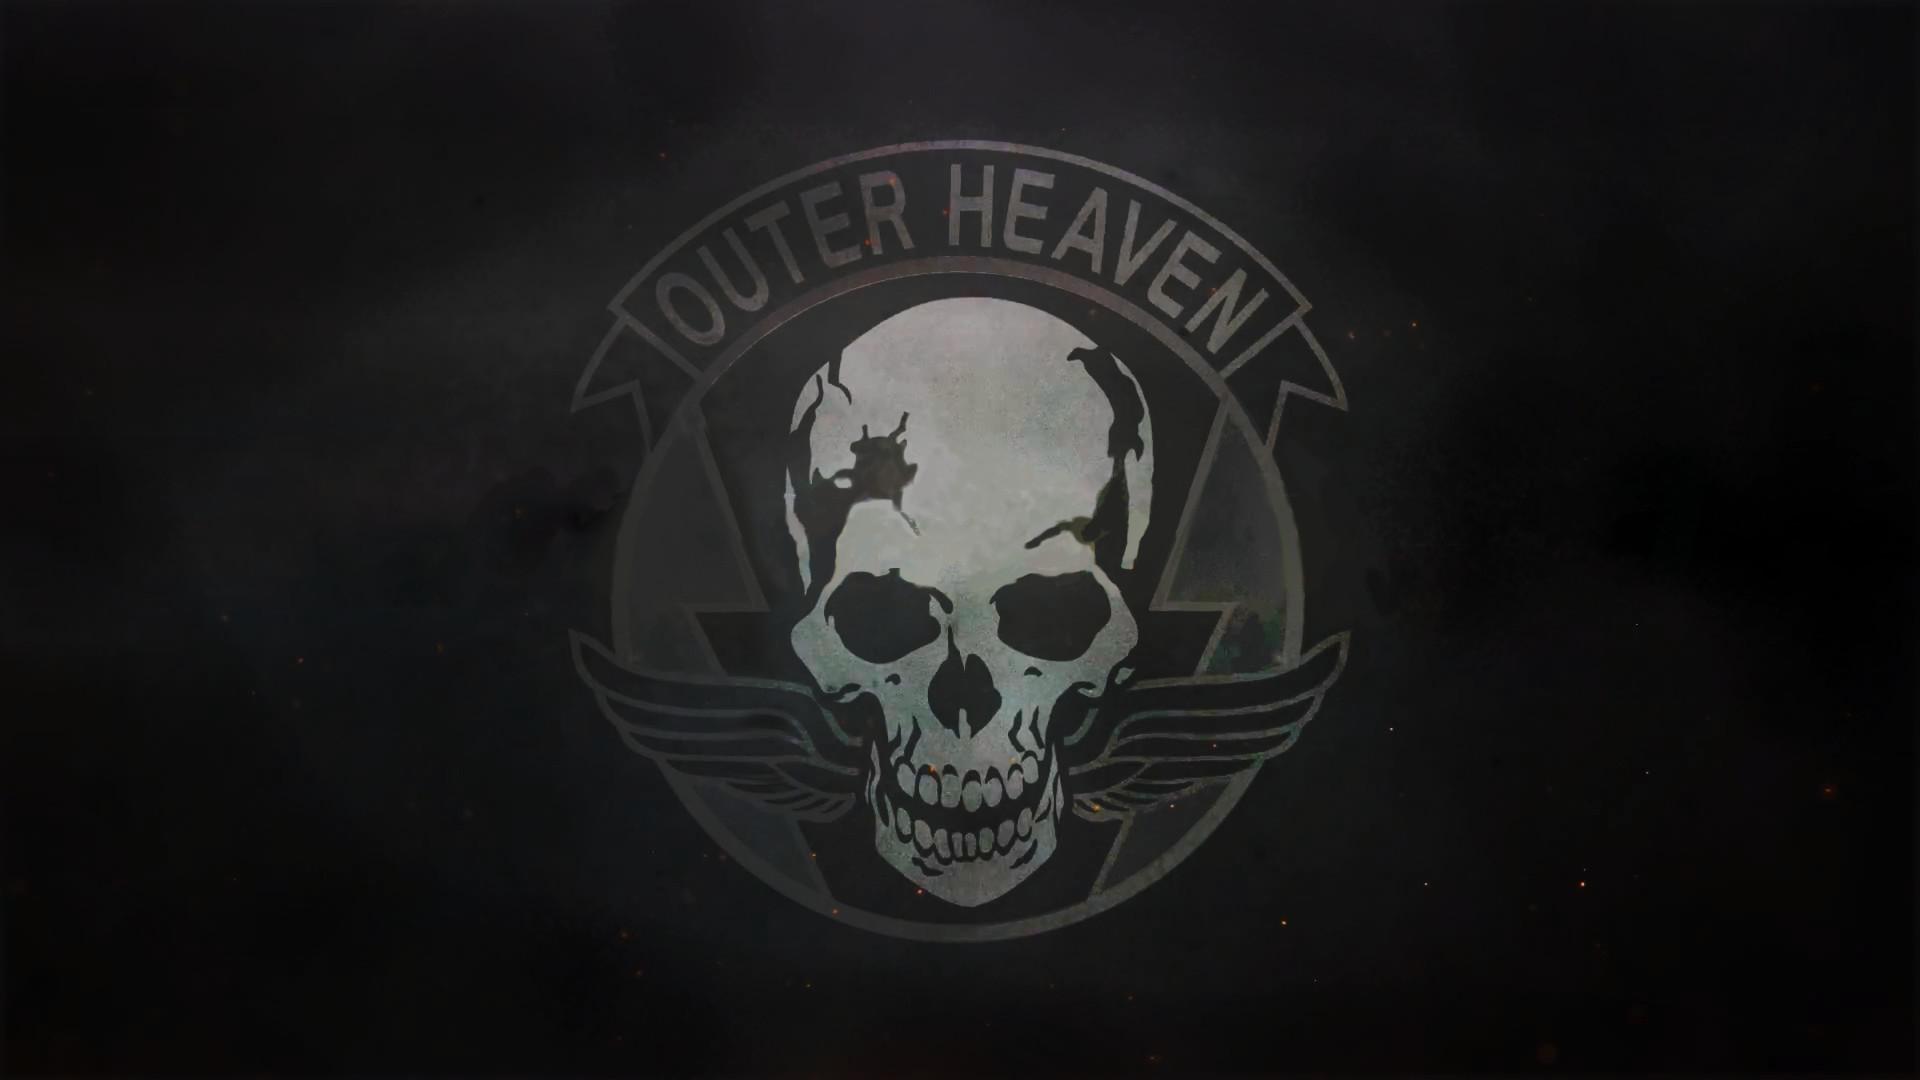 Metal Gear Hd Wallpaper Background Image 1920x1080 Id